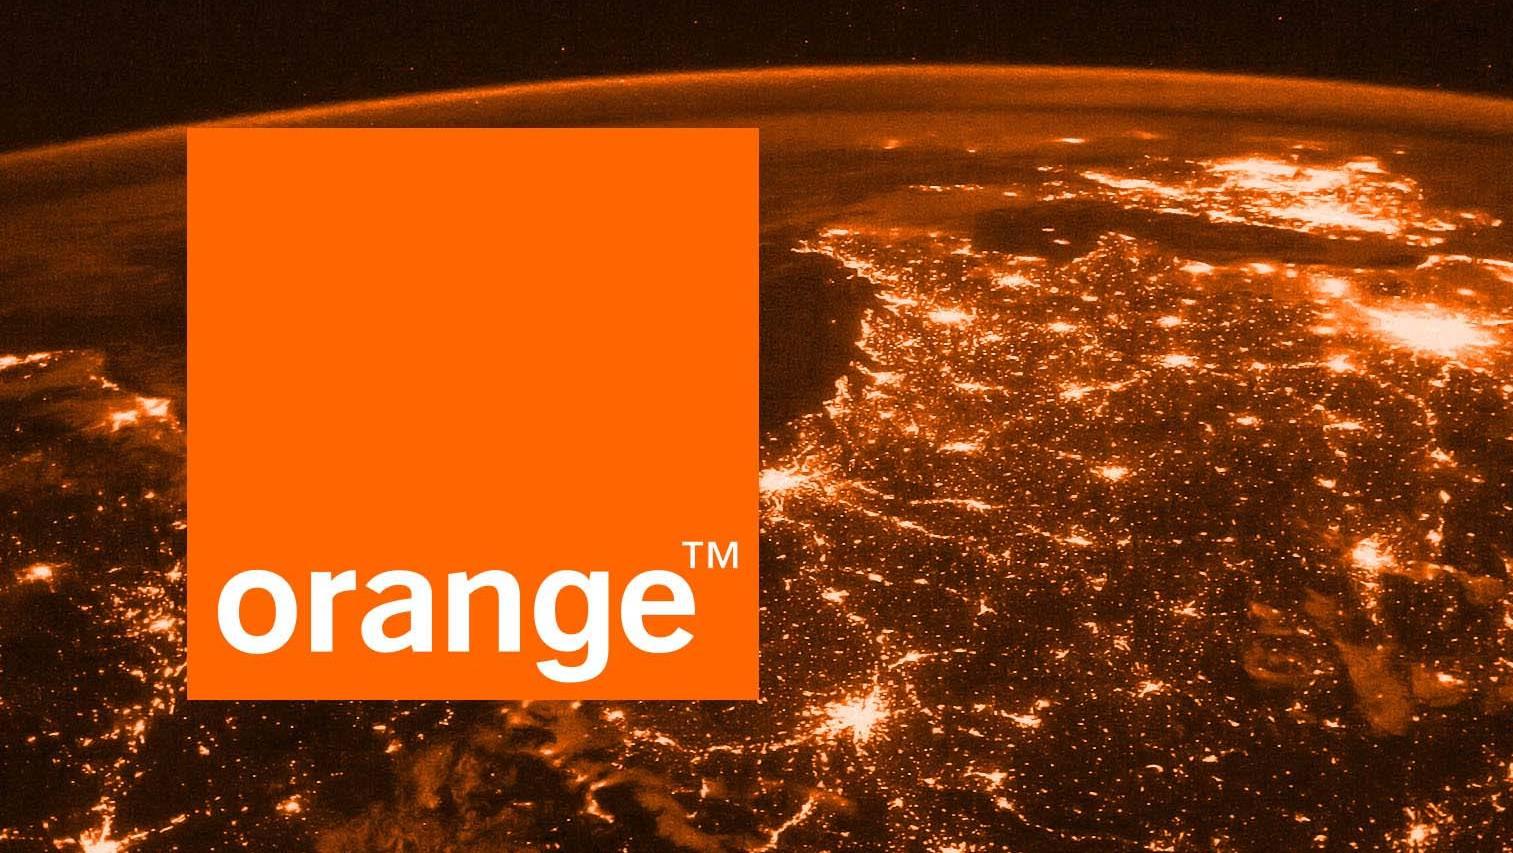 28 Iulie, Orange Romania are Preturi cu MULT REDUSE la Telefoane Mobile